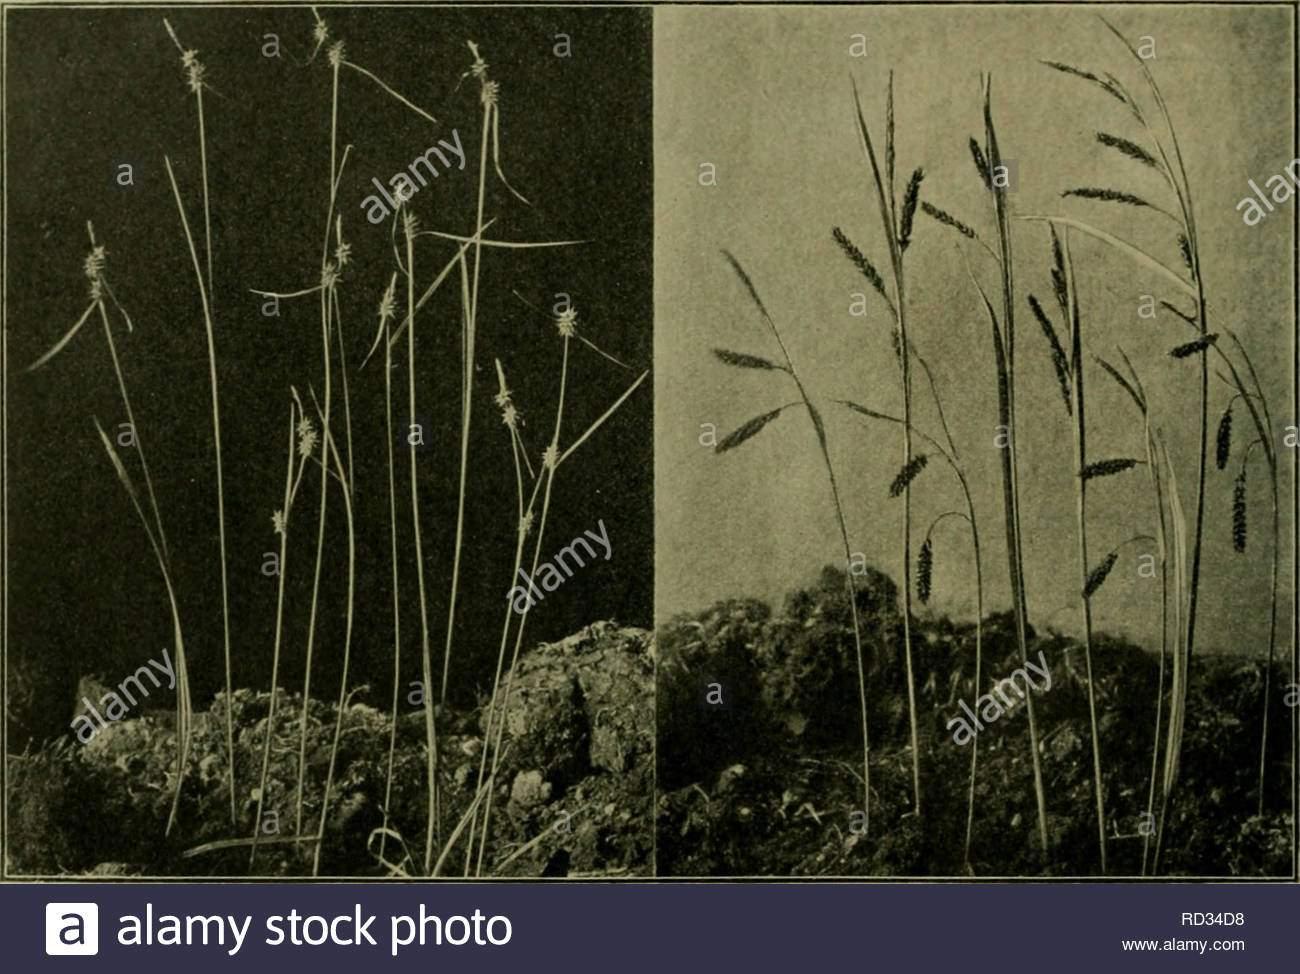 das leben der pflanze plants plants plants phytogeography 152 5ic rfcr ntce brafonifrfjc iiarcgcl 9apoieon slnftofe 311 einer jicnge rfinbungcn qab f erucrifoinintc man nun in 5erc anuin bie rfinbung auf jicrfjuten 3u fdrei6en bie fcitbem nicft mclv iniebcr unterging fonbcrn einige orljunberte fpter al 4 crgomcntquot ben tapijru noftnbig uergcifcn liclj 2ic anbercn 3gteriuanbten ber opierftaube nu ber attung cyperus finb fr bie triipcnlntpfc fcnngeicnenb ginetne aerbingo unanfenlid e umfinnnen nod in jjjitteleuropa xei RD34D8